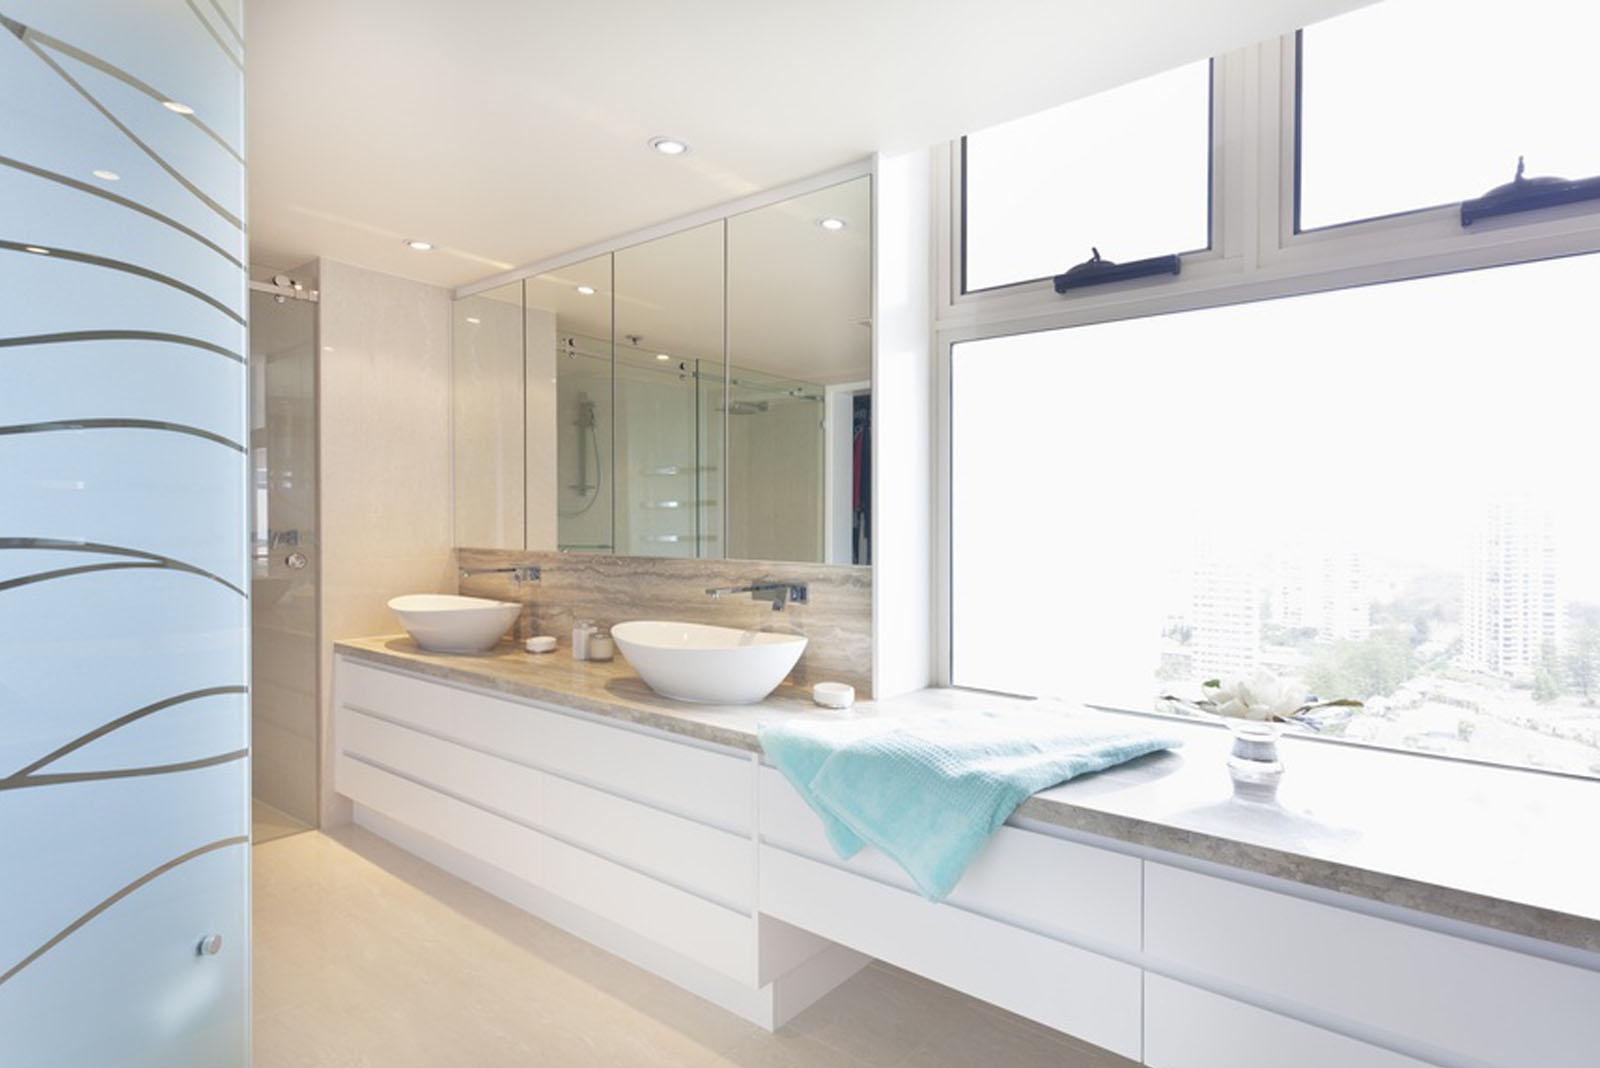 Bathroom design Kincir Bali WP